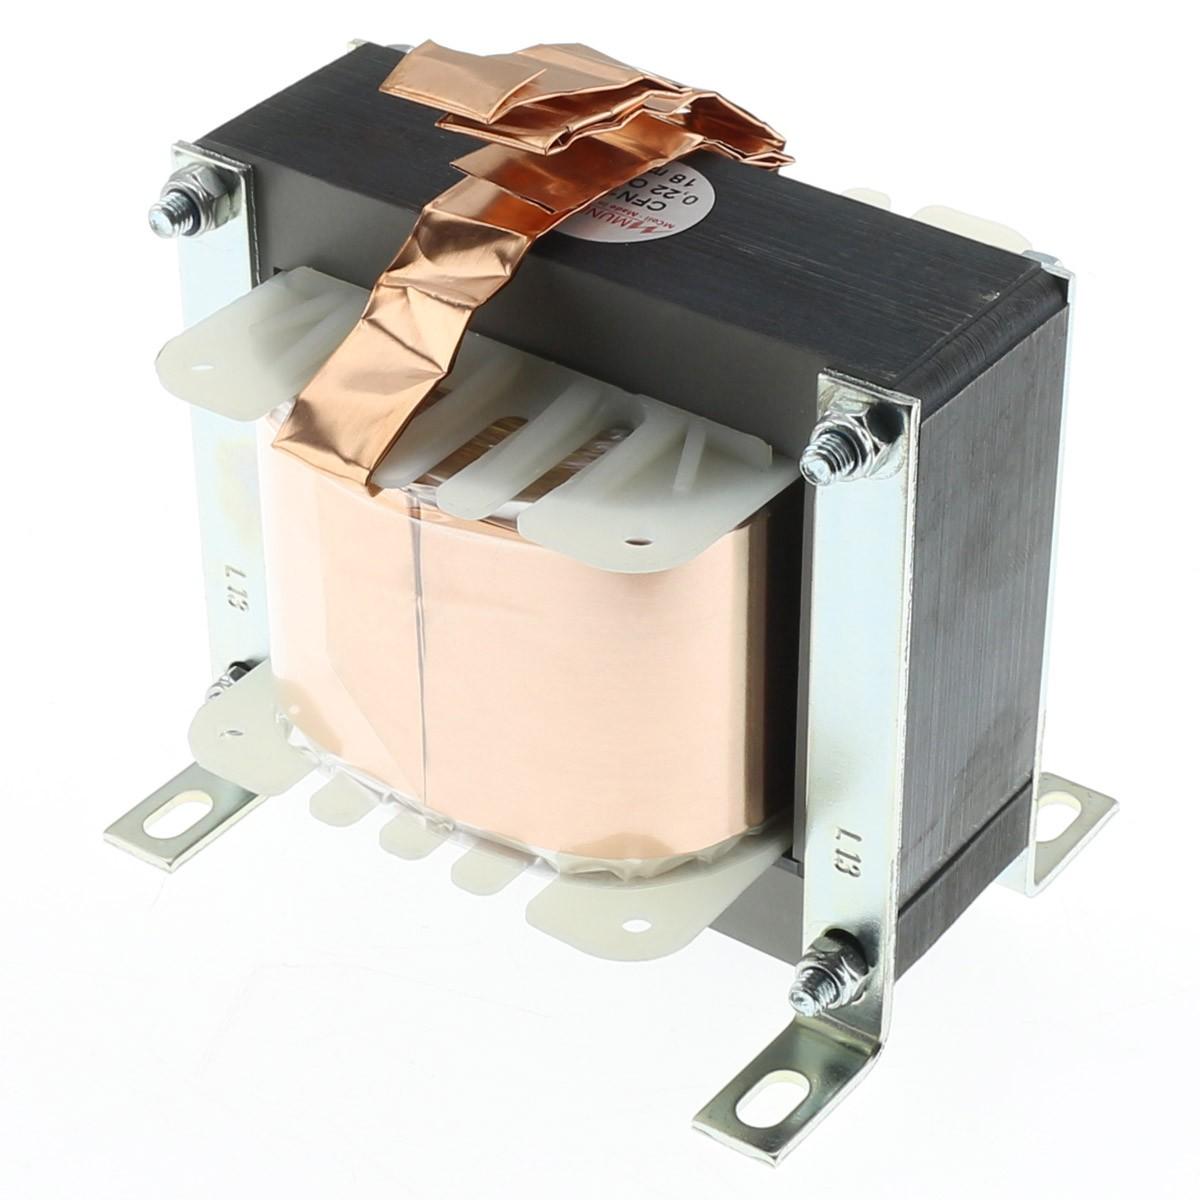 MUNDORF CFN14 FOIL COIL Bobine Cuivre Zero-Ohm Noyau Feron 3.9mH